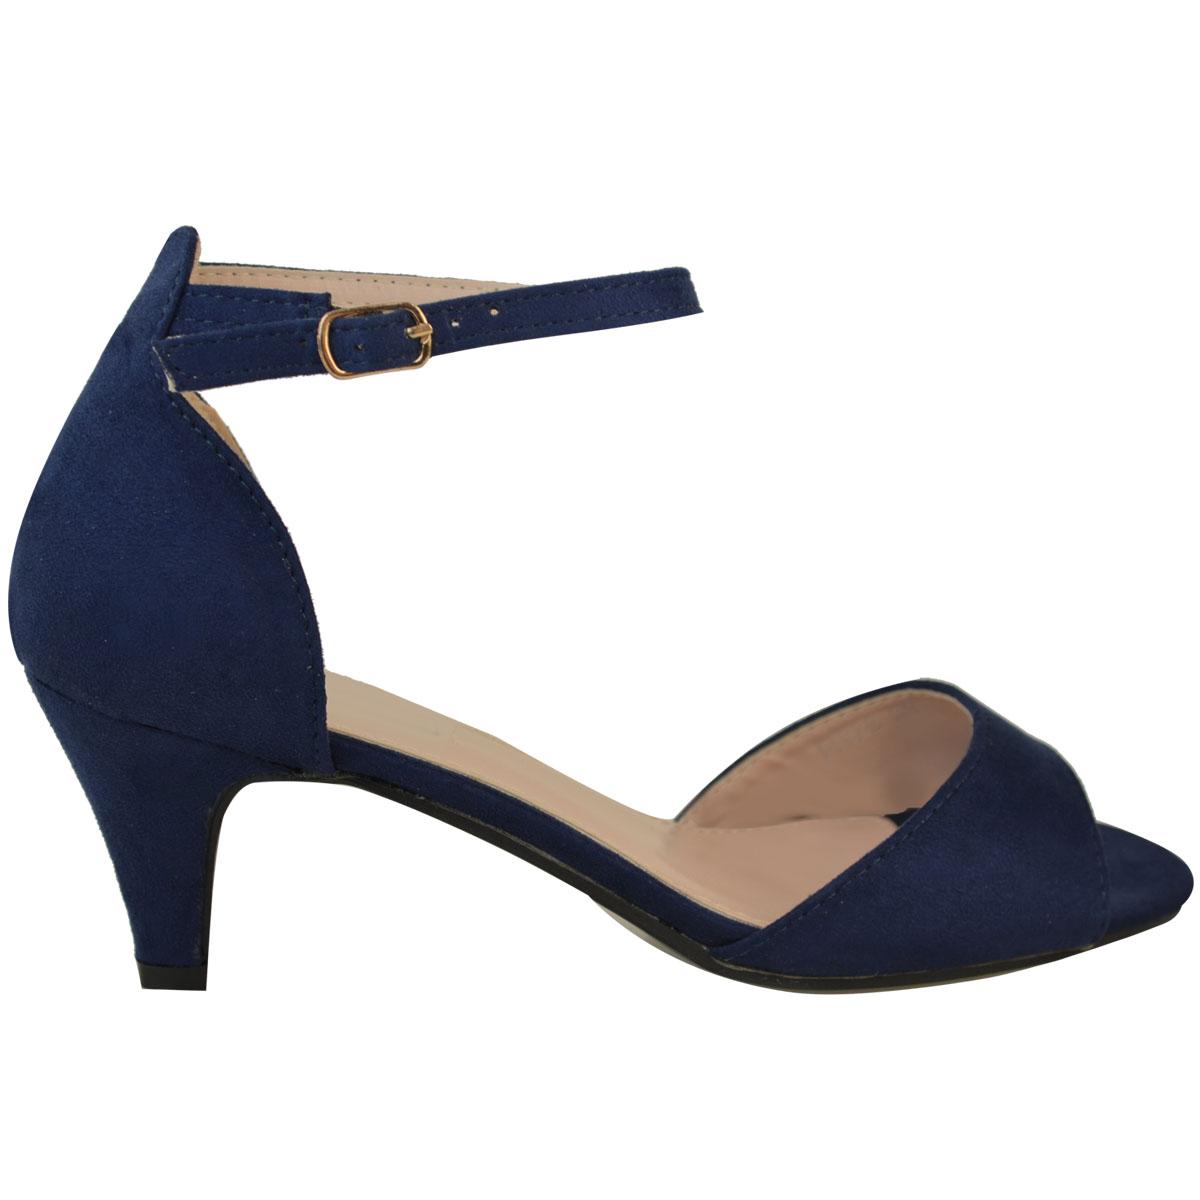 e75dff26aeb Womens Ladies Low Kitten Heel Wedge Court Shoes Black Work Sandals ...